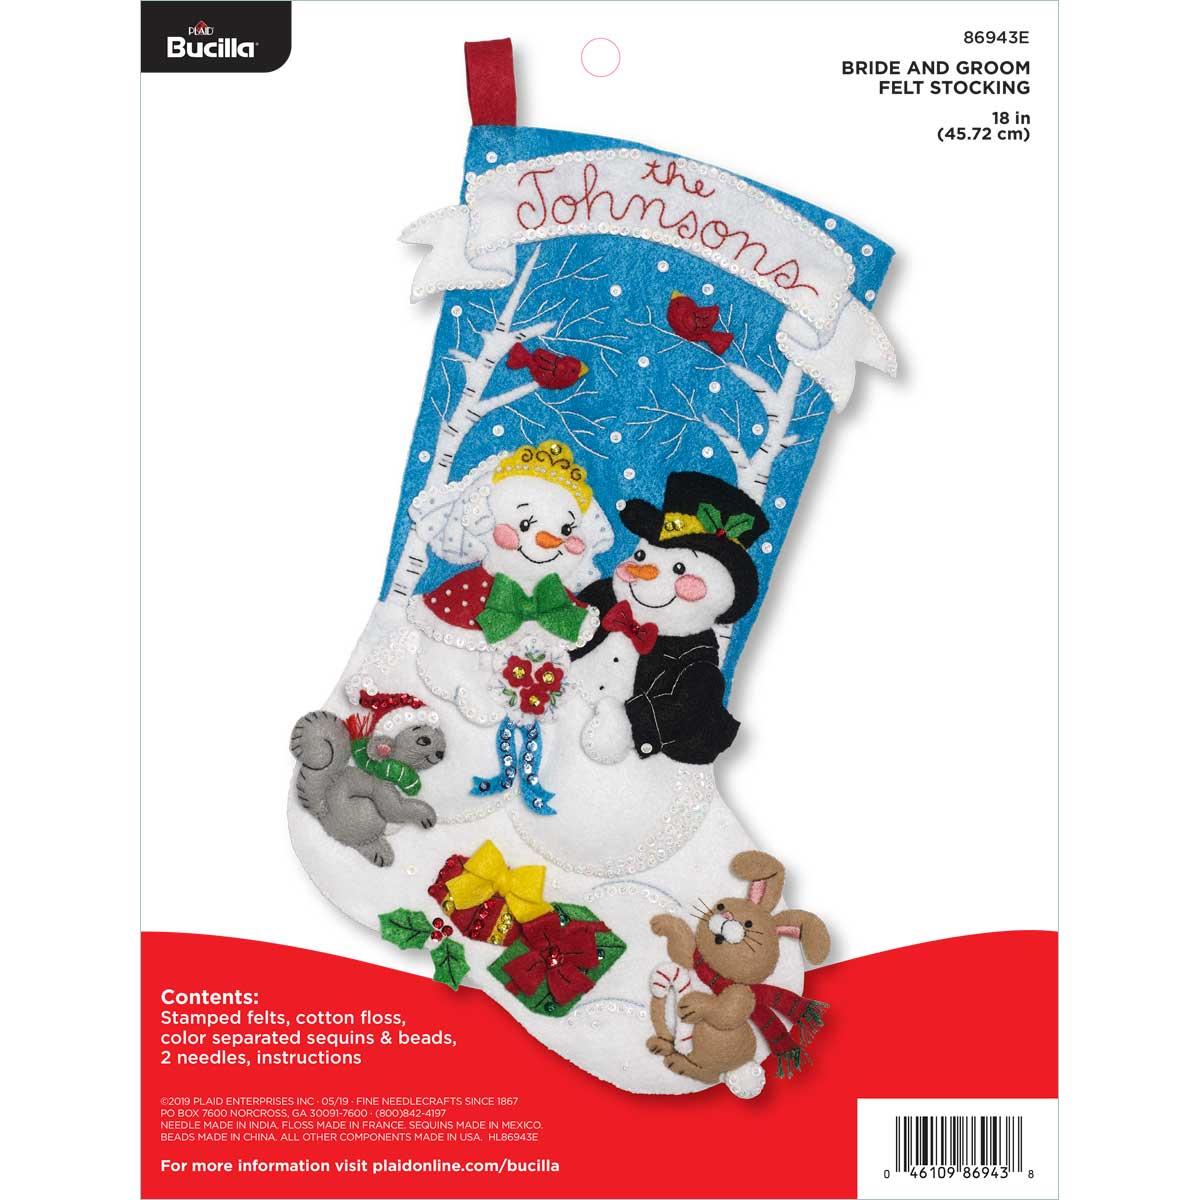 Bucilla Christmas Stocking Kits.Bucilla Seasonal Felt Stocking Kits Bride And Groom